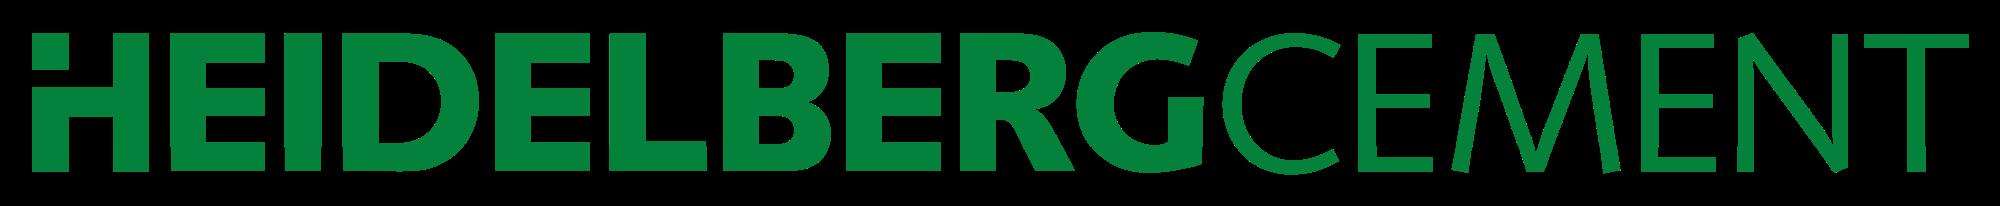 Logo de Heidelberg Cement